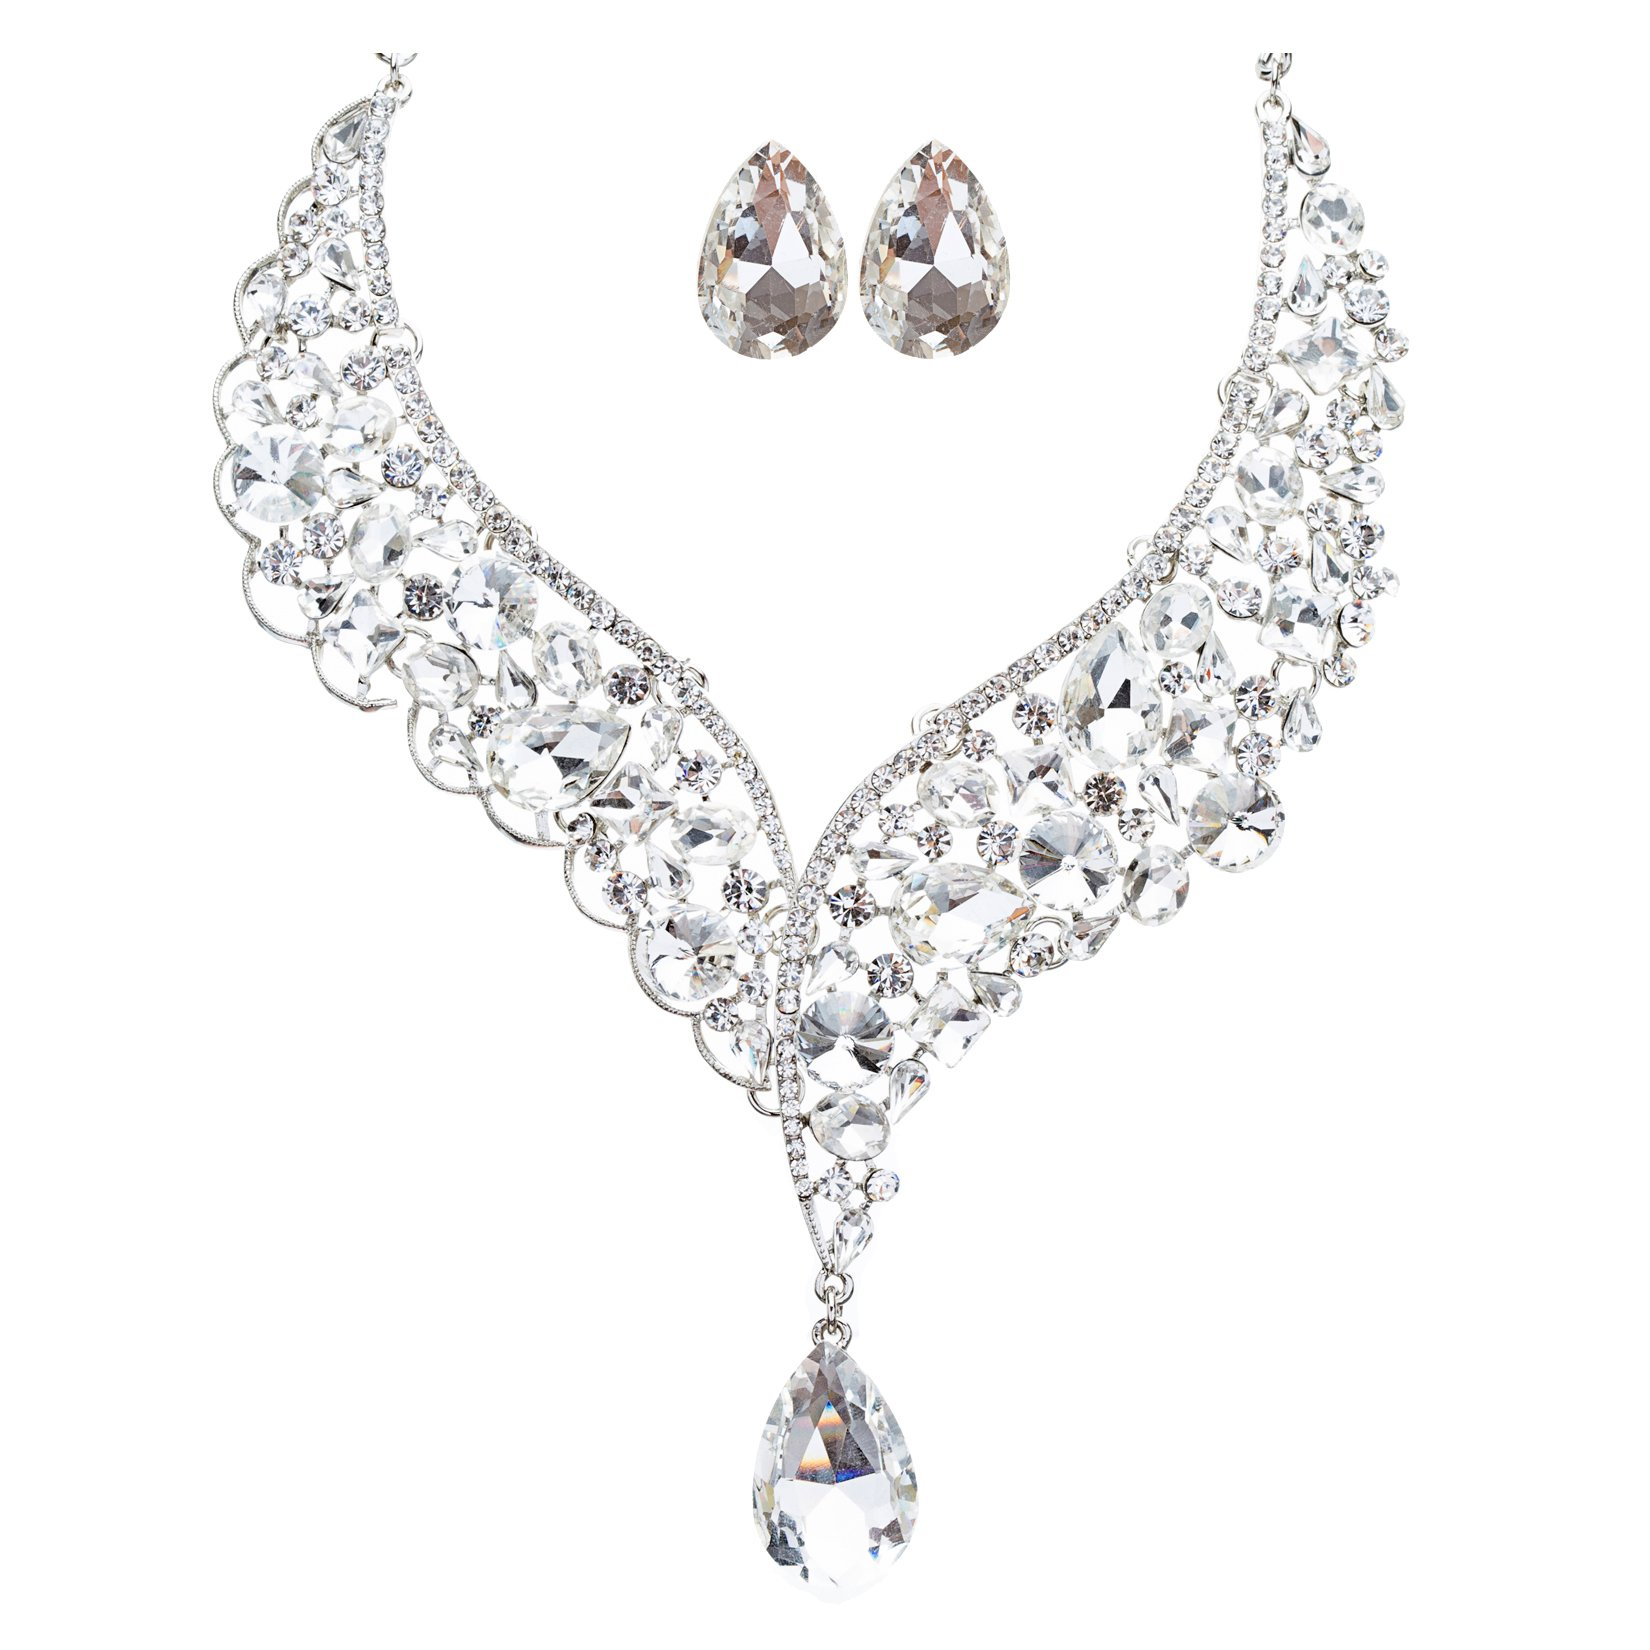 Bridal Wedding Jewelry Crystal Rhinestone Exquisite Embedded Necklace J505 SLV